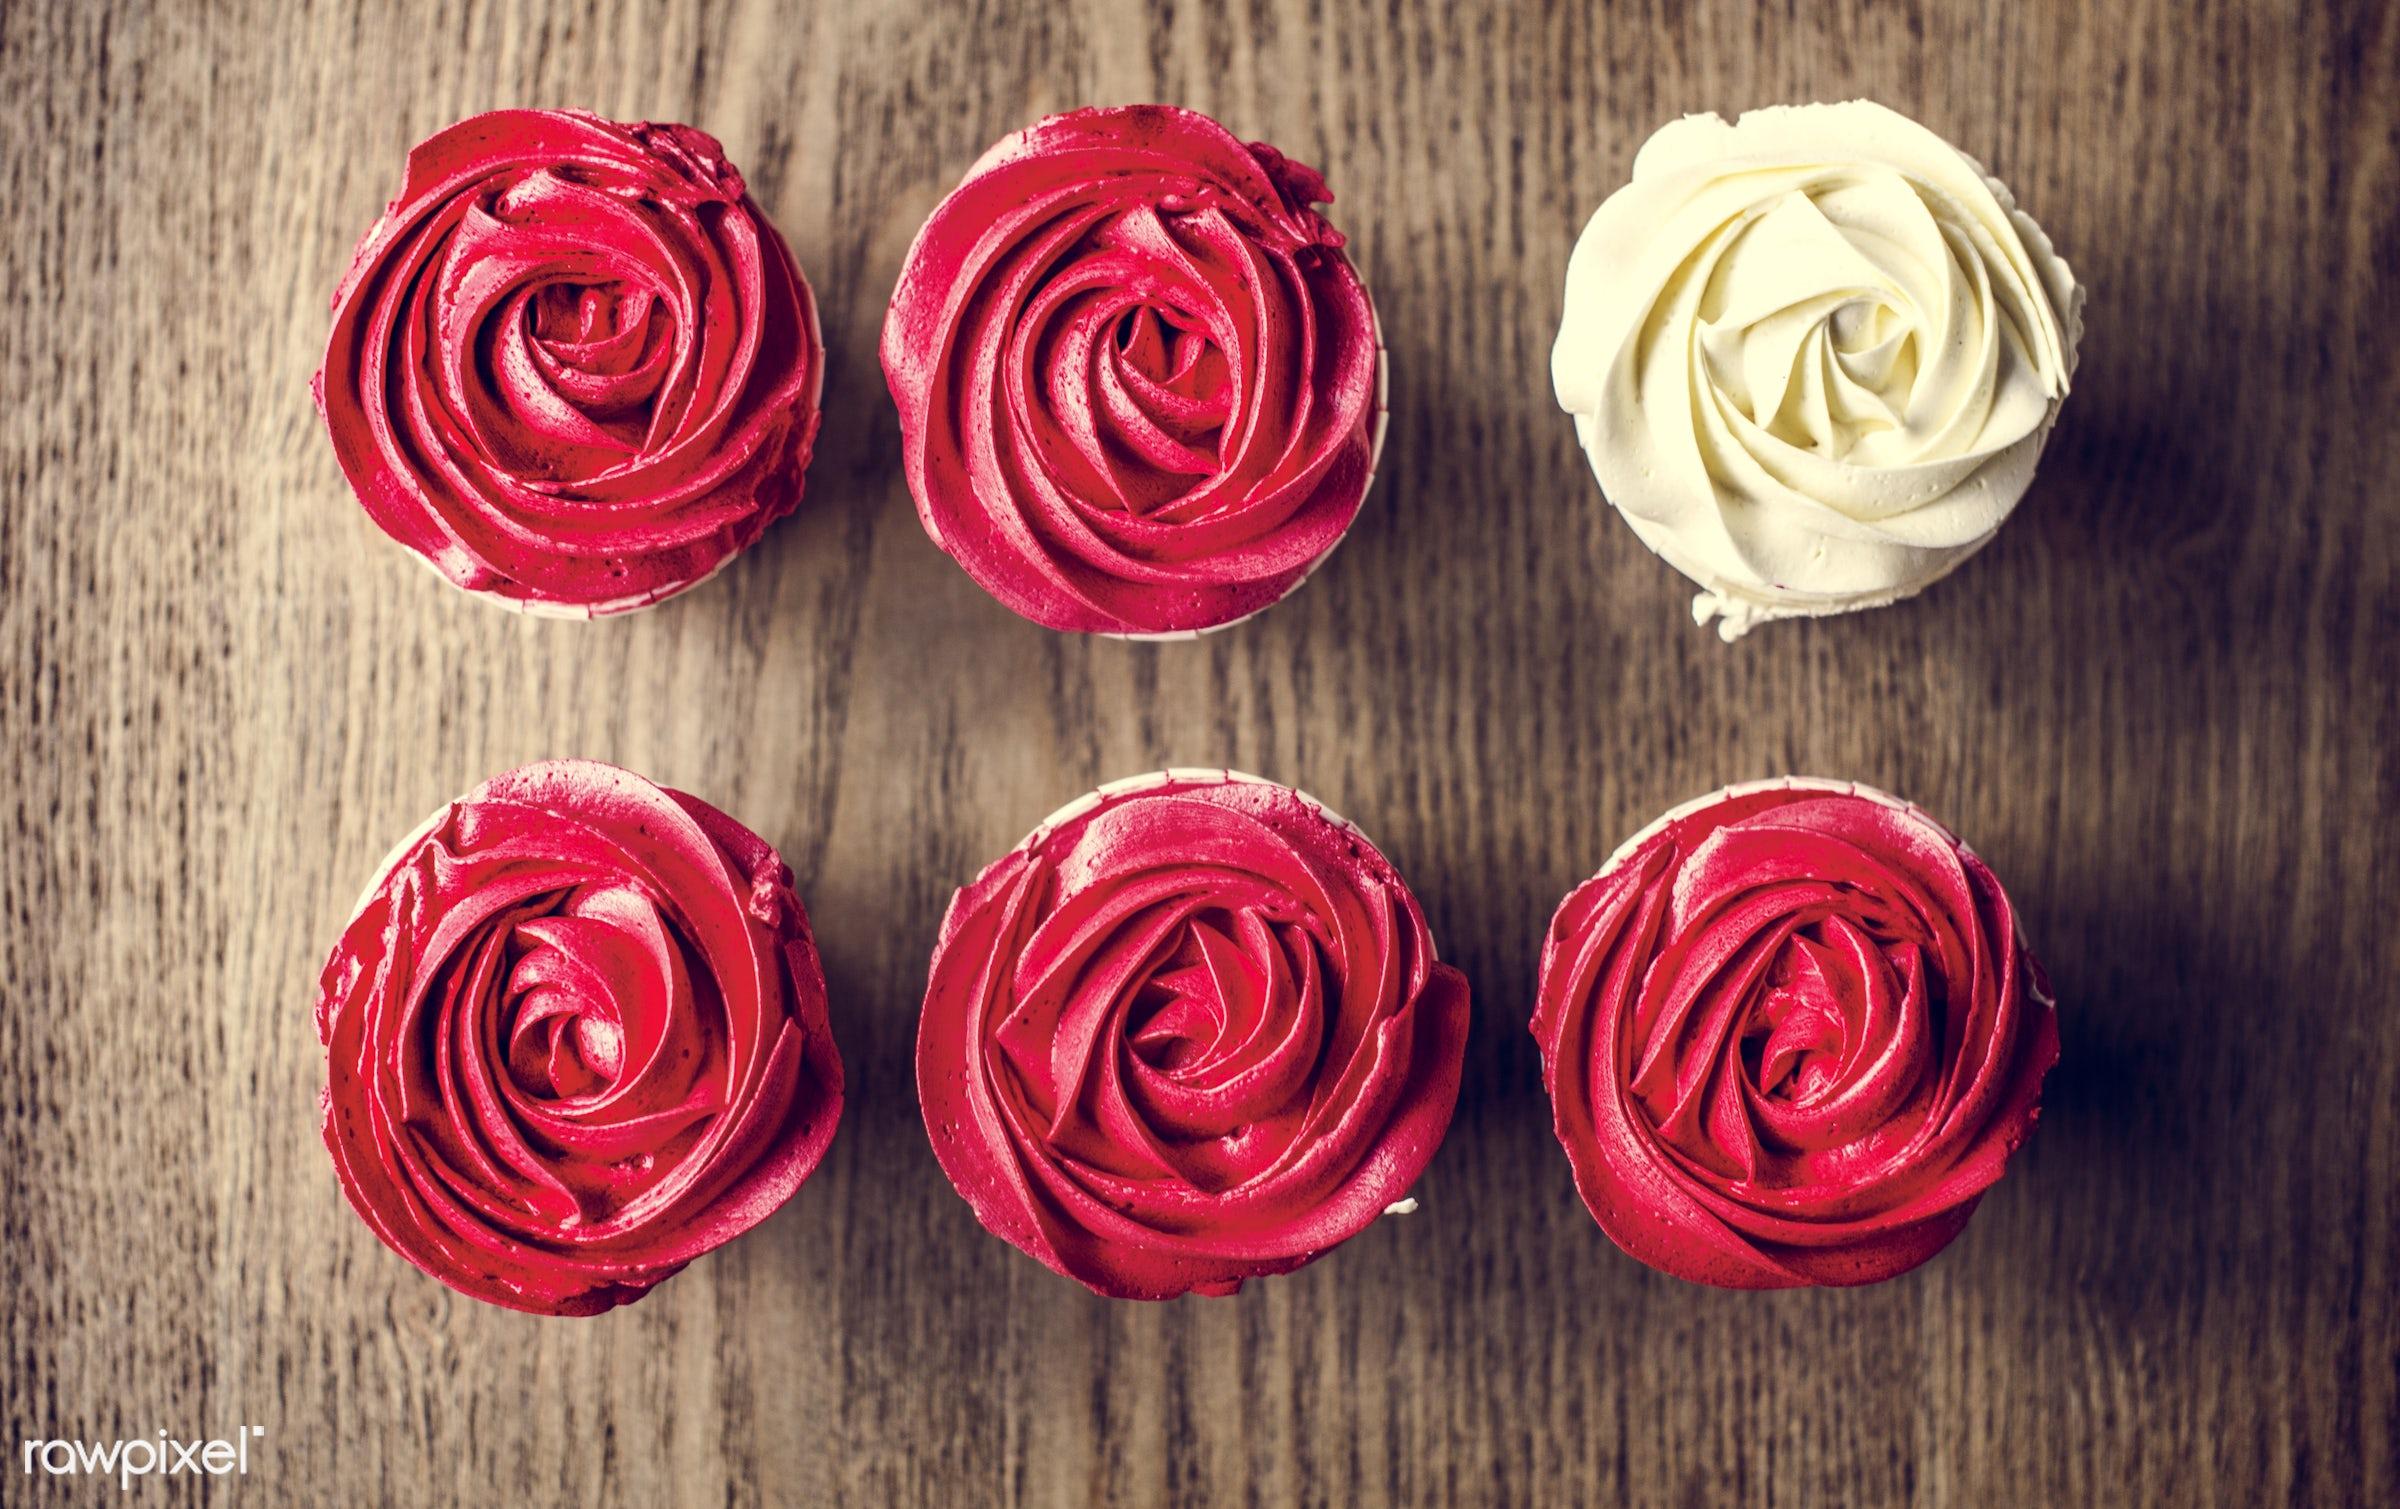 dish, cup, nobody, recipe, appetite, party, taste, event, gourmet, dessert, cake, white, rose, tasty, sweet, food, eat,...